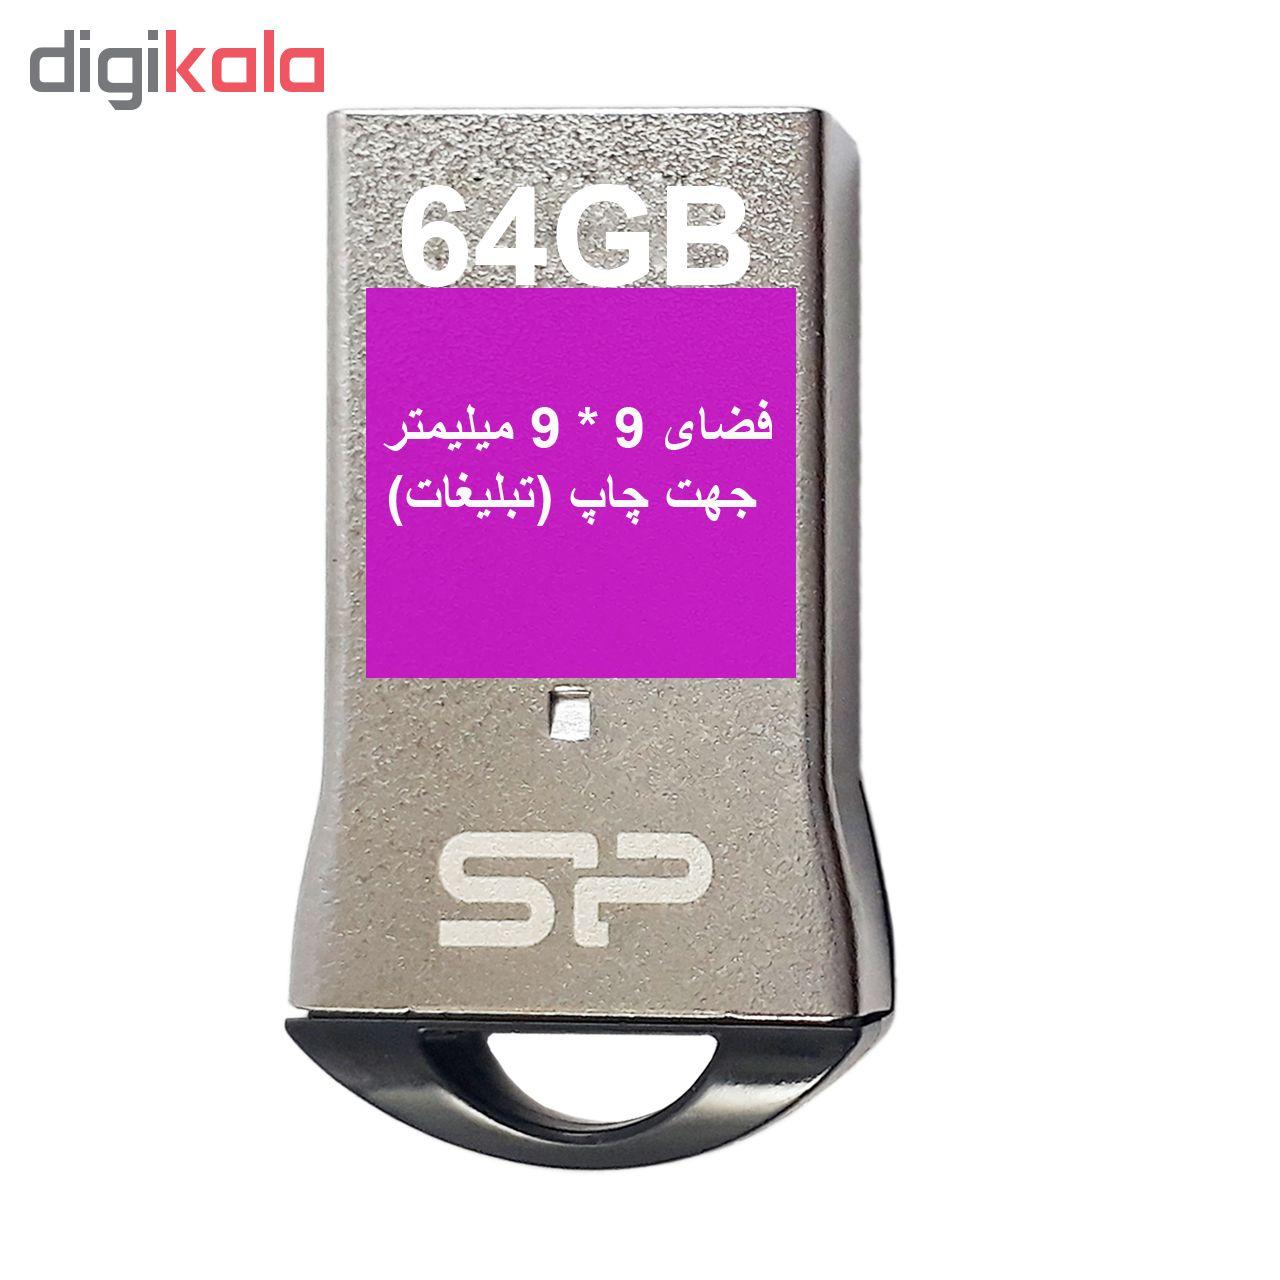 فلش مموری سیلیکون پاور مدل Touch T01 ظرفیت 64 گیگابایت  main 1 7